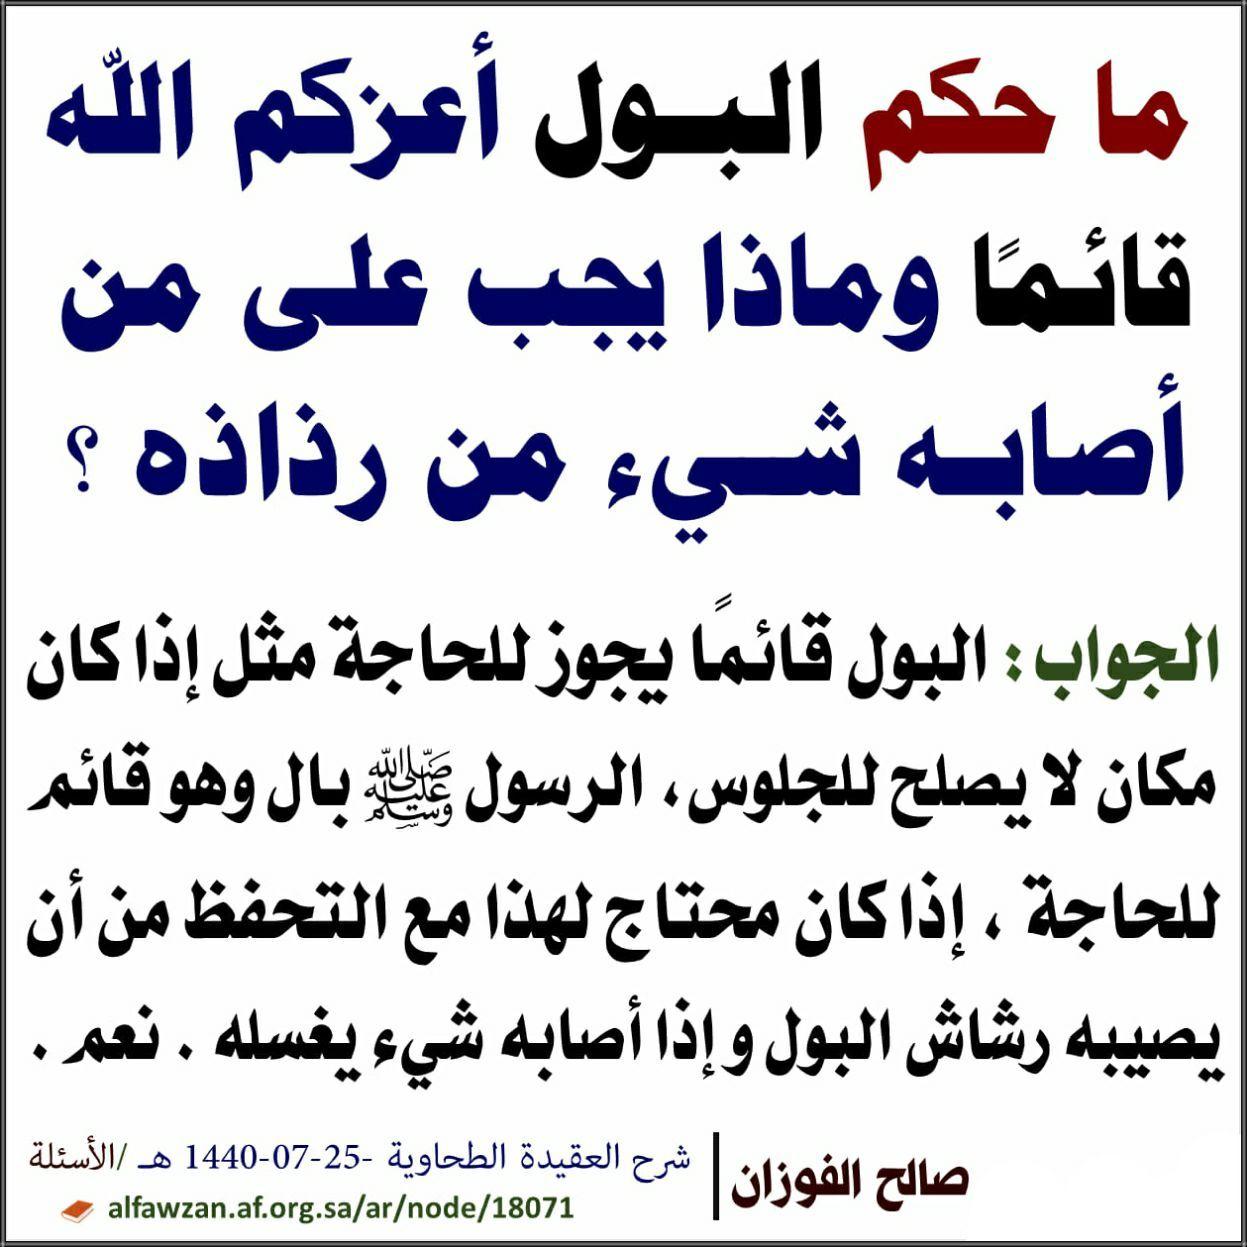 Pin By الأثر الجميل On فتاوى Islamic Love Quotes Islamic Quotes Good Morning Arabic